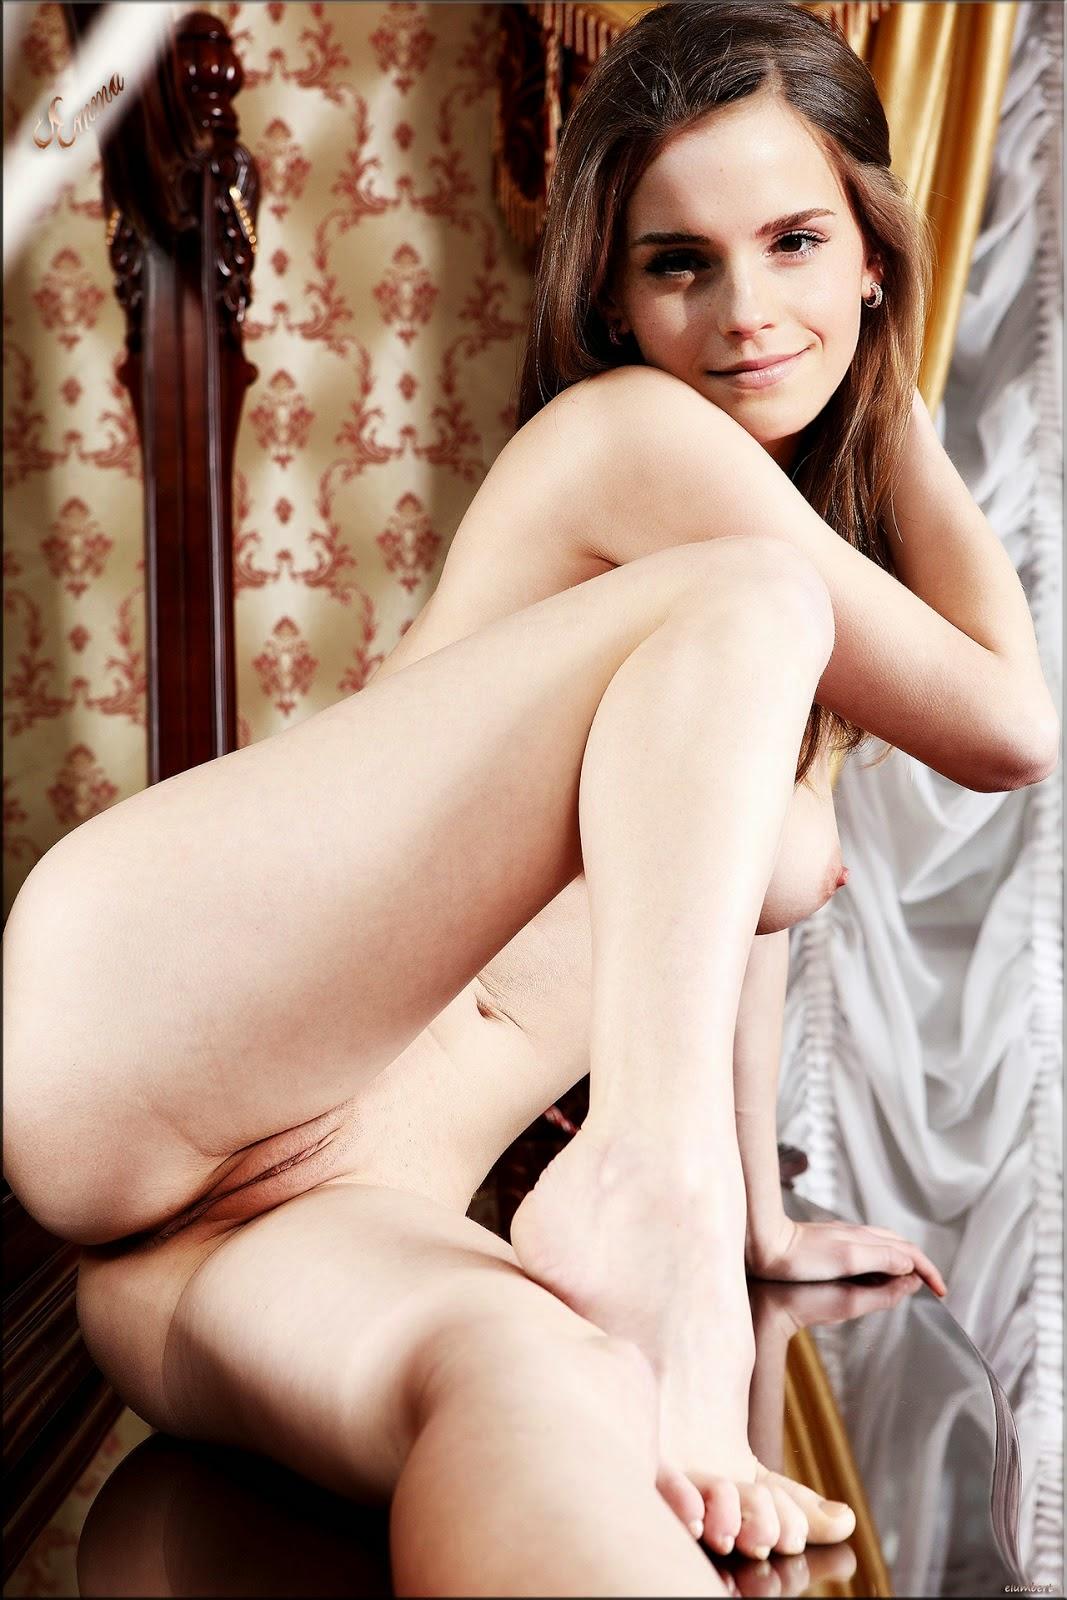 image Sexy busty ellen toilet blowjob with her boyfriend